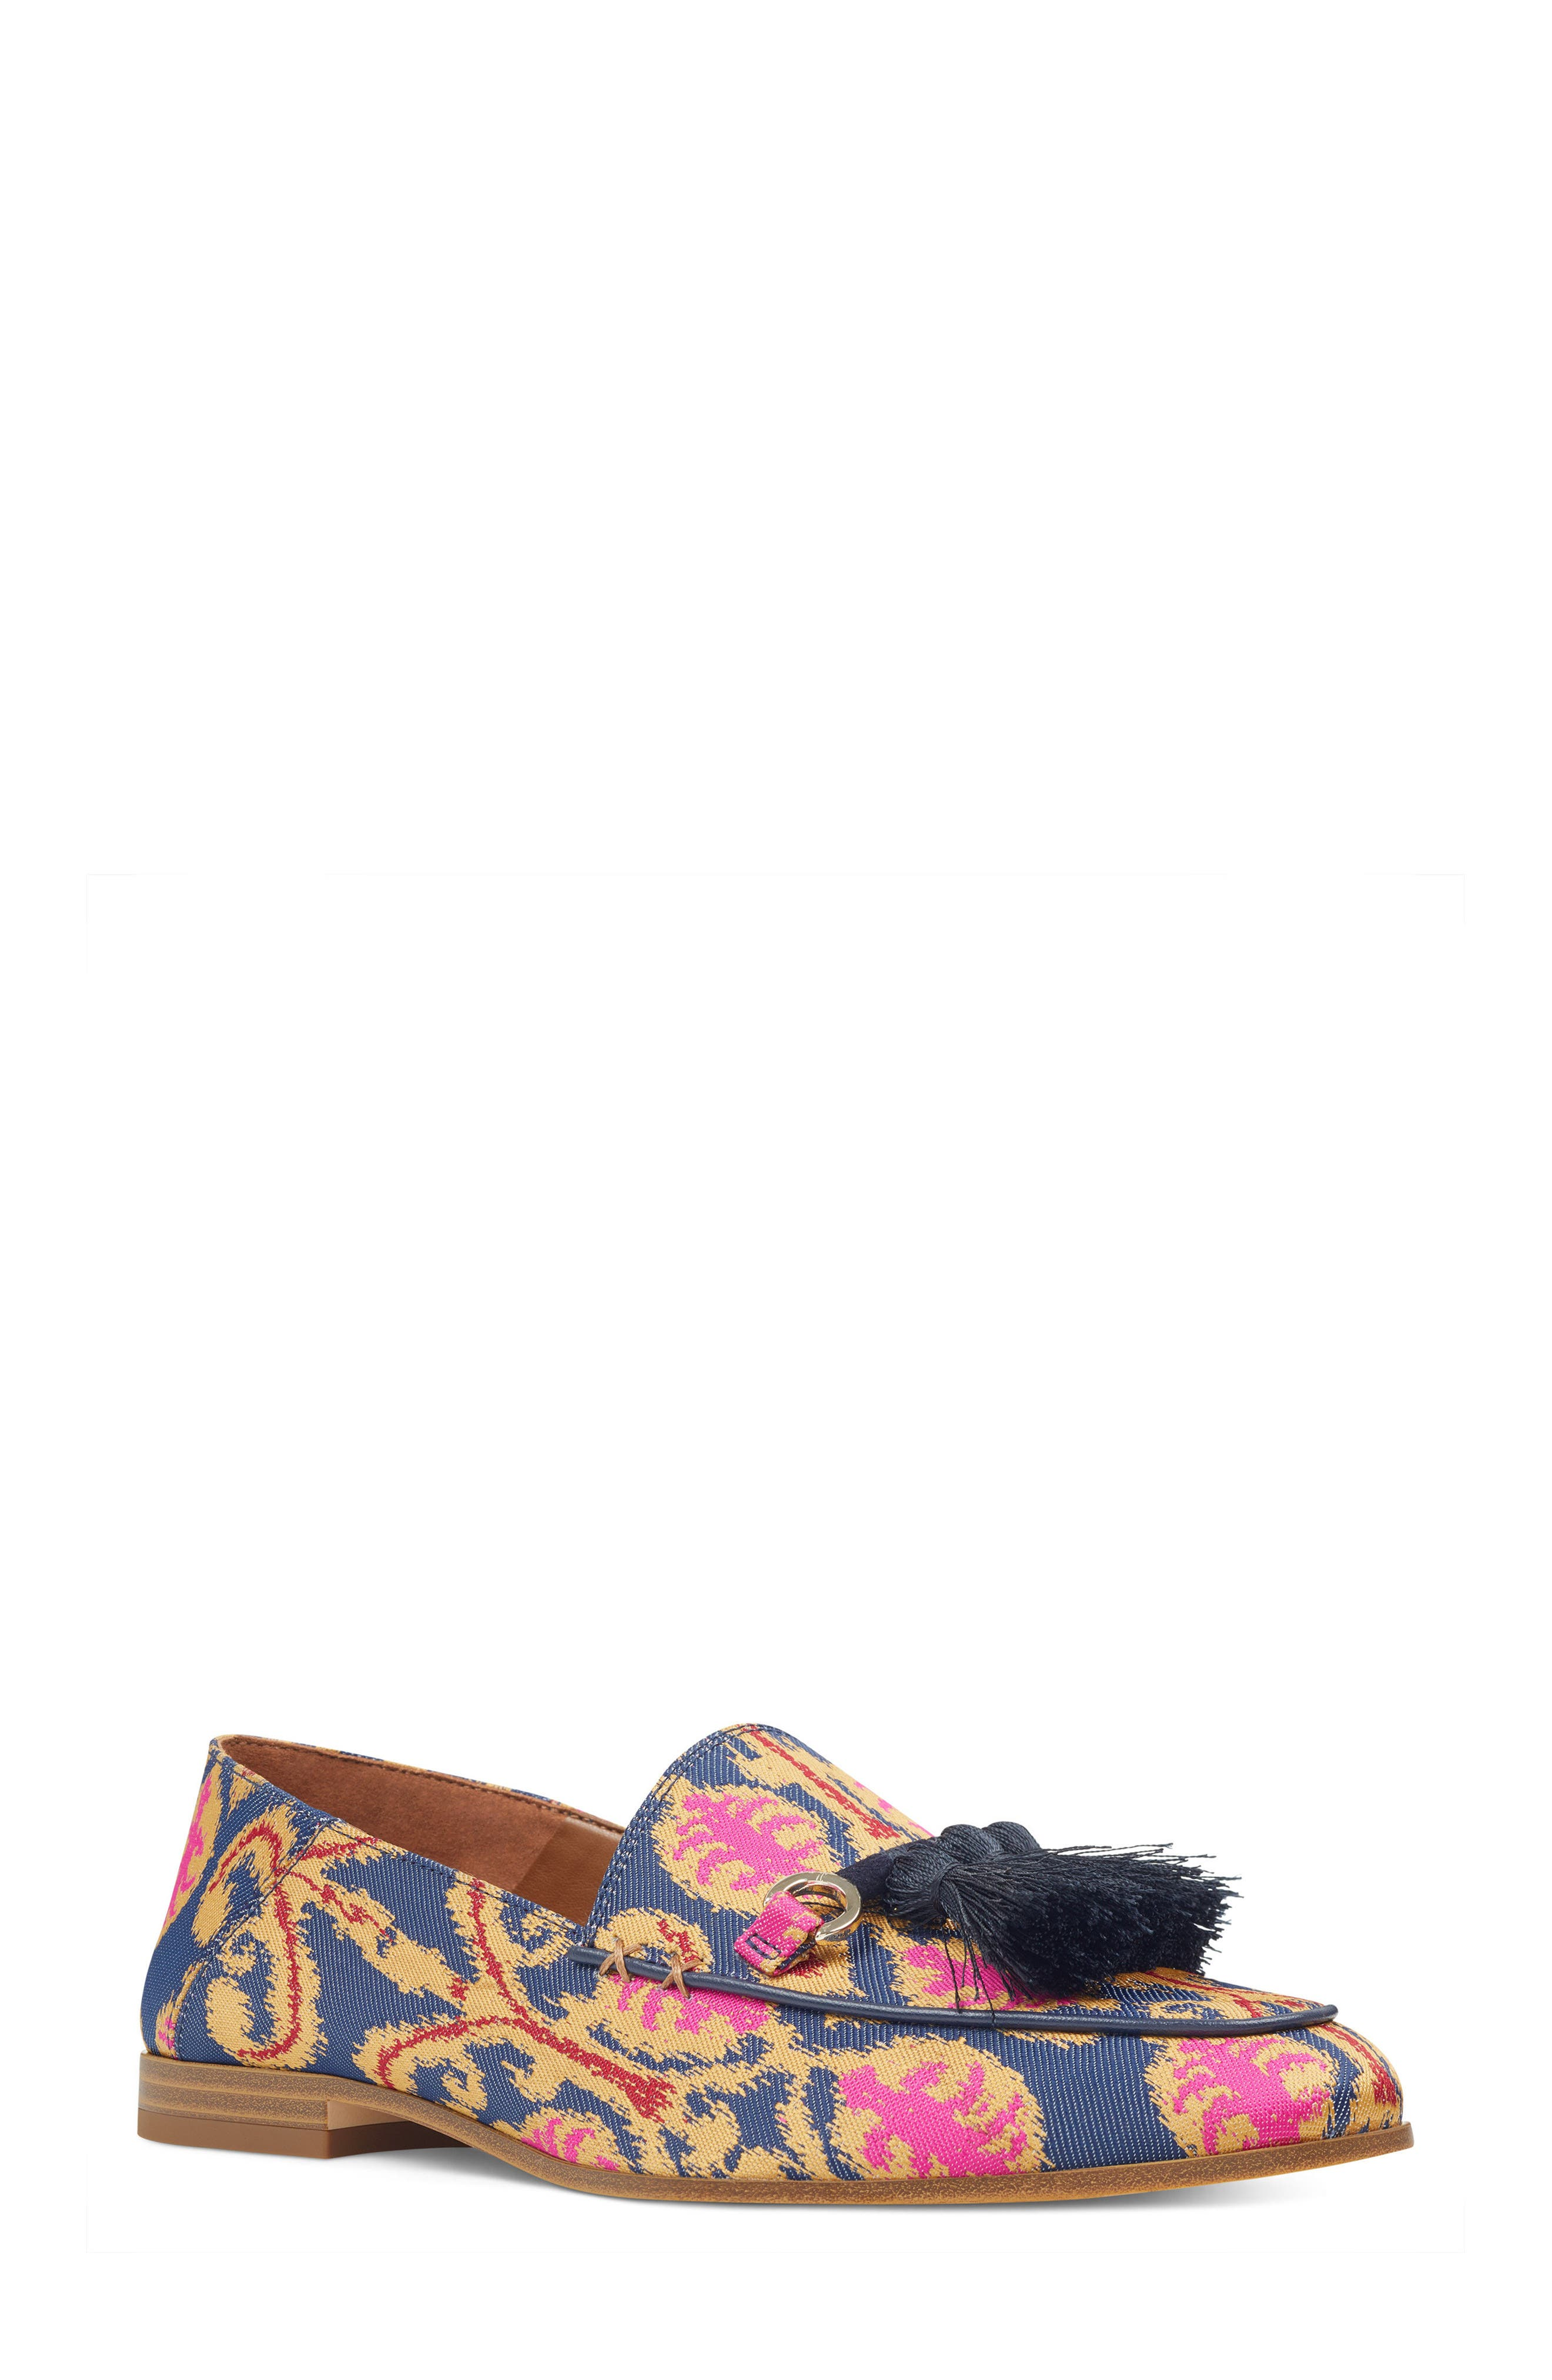 Weslir Tassel Loafer,                             Main thumbnail 1, color,                             Blue Multi Fabric